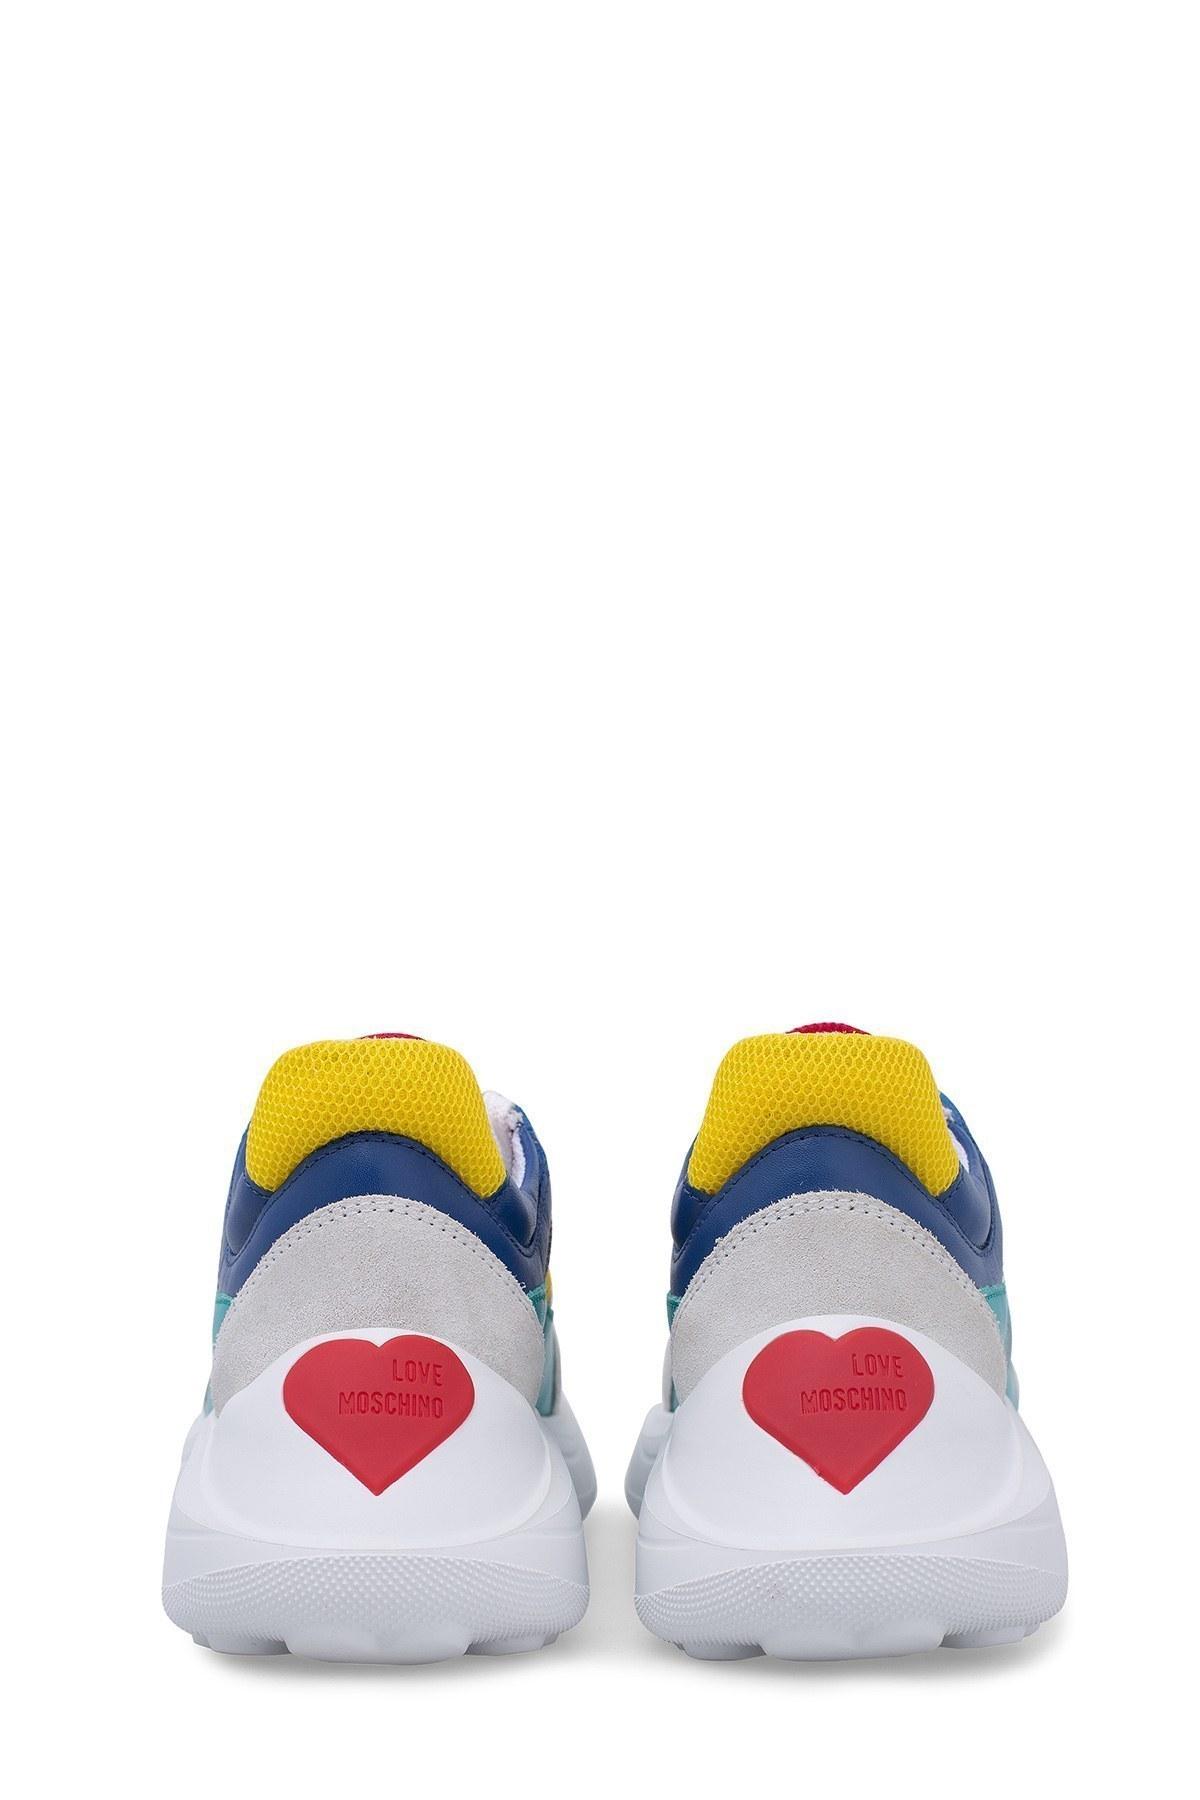 Love Moschino Kadın Ayakkabı JA15306G1A40A BEYAZ